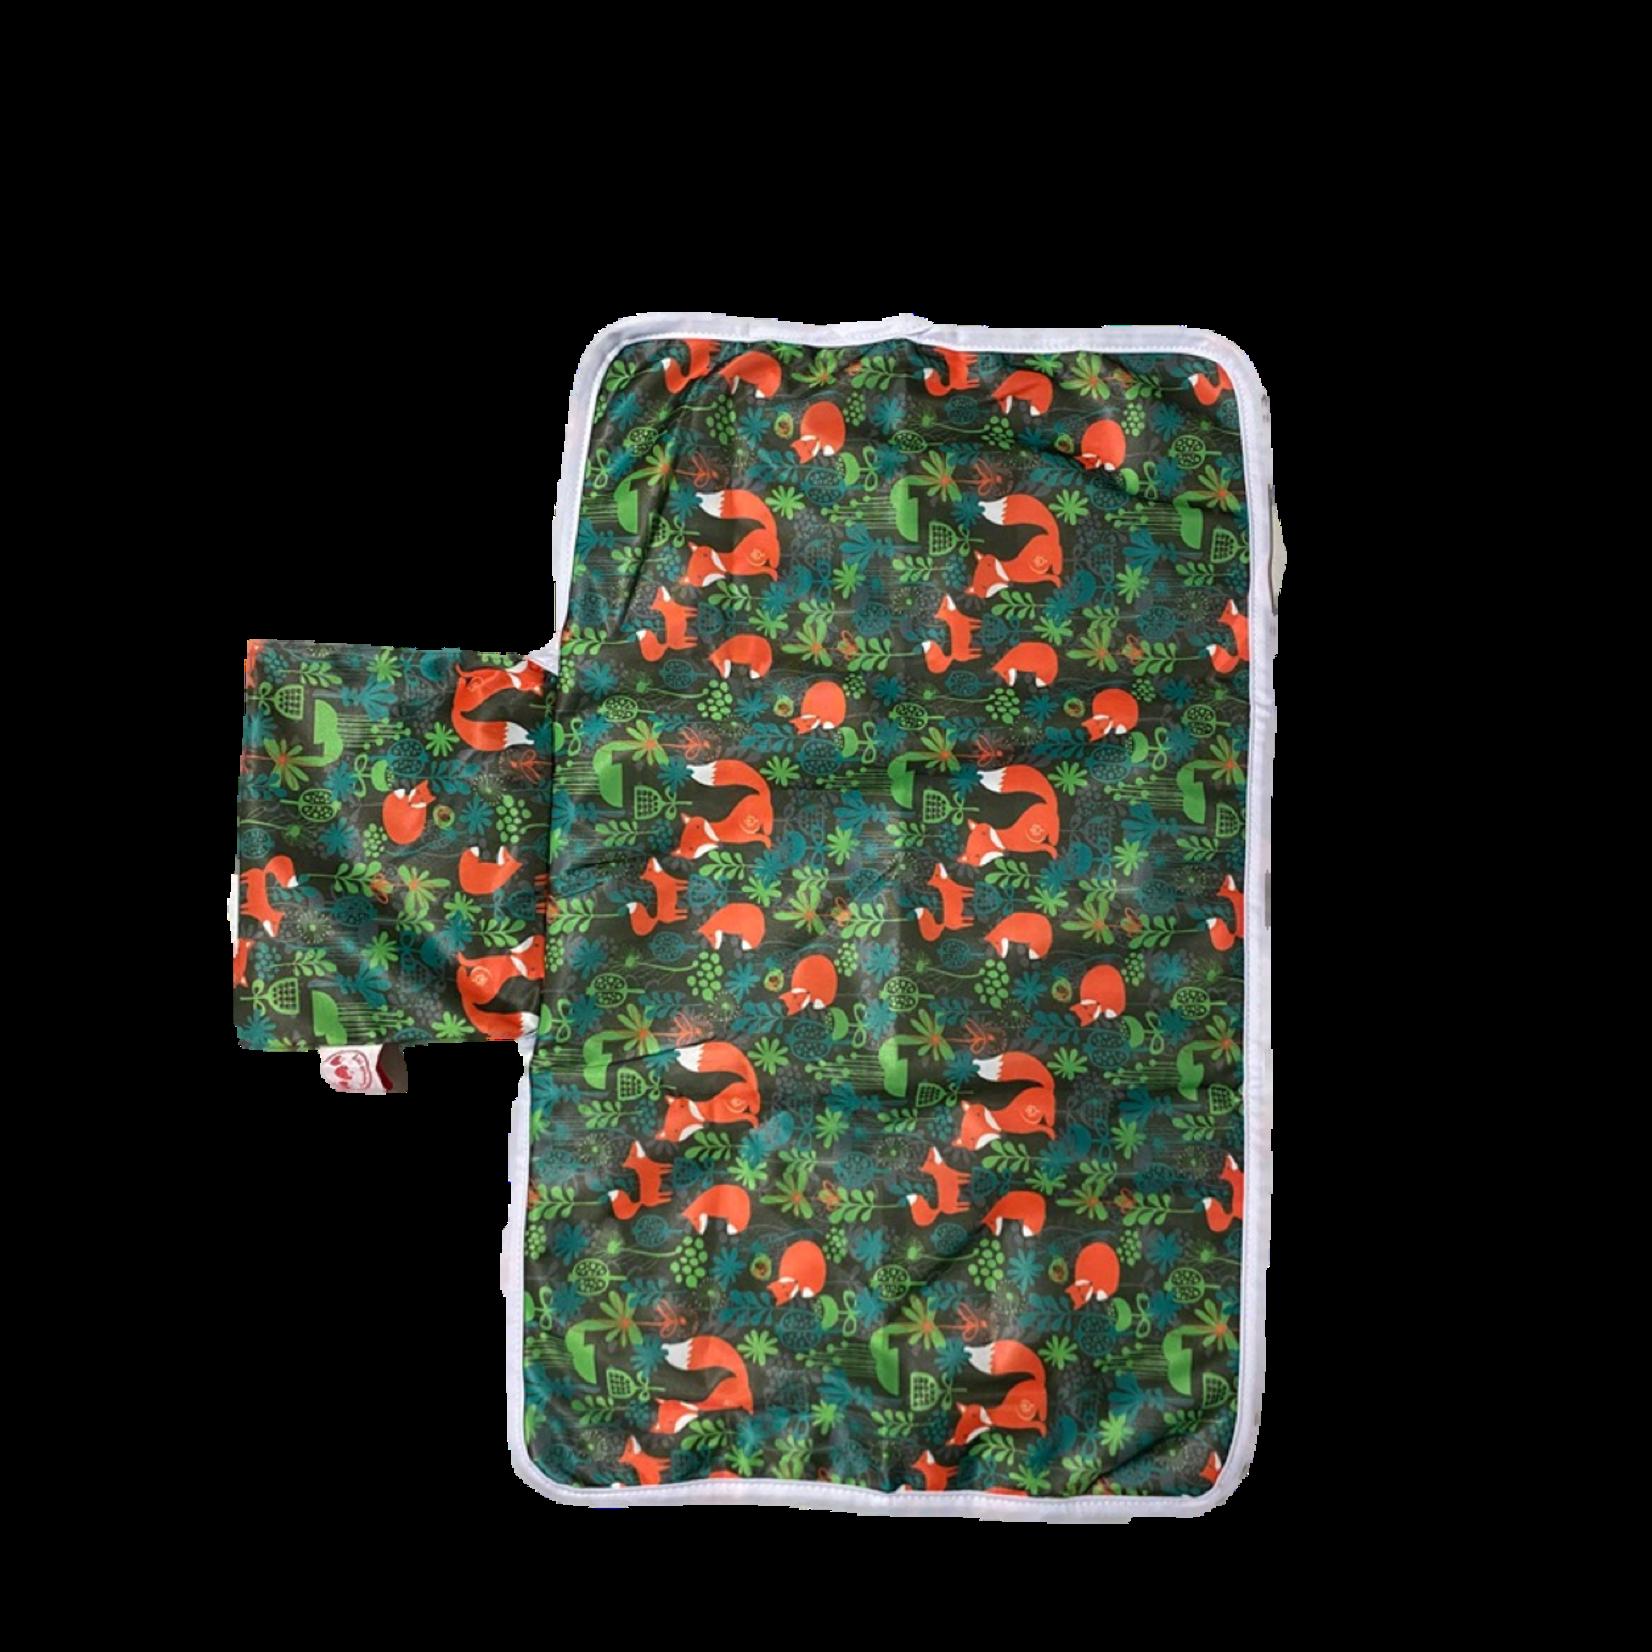 Little Strawberries Little Strawberries Pocket Change Mat